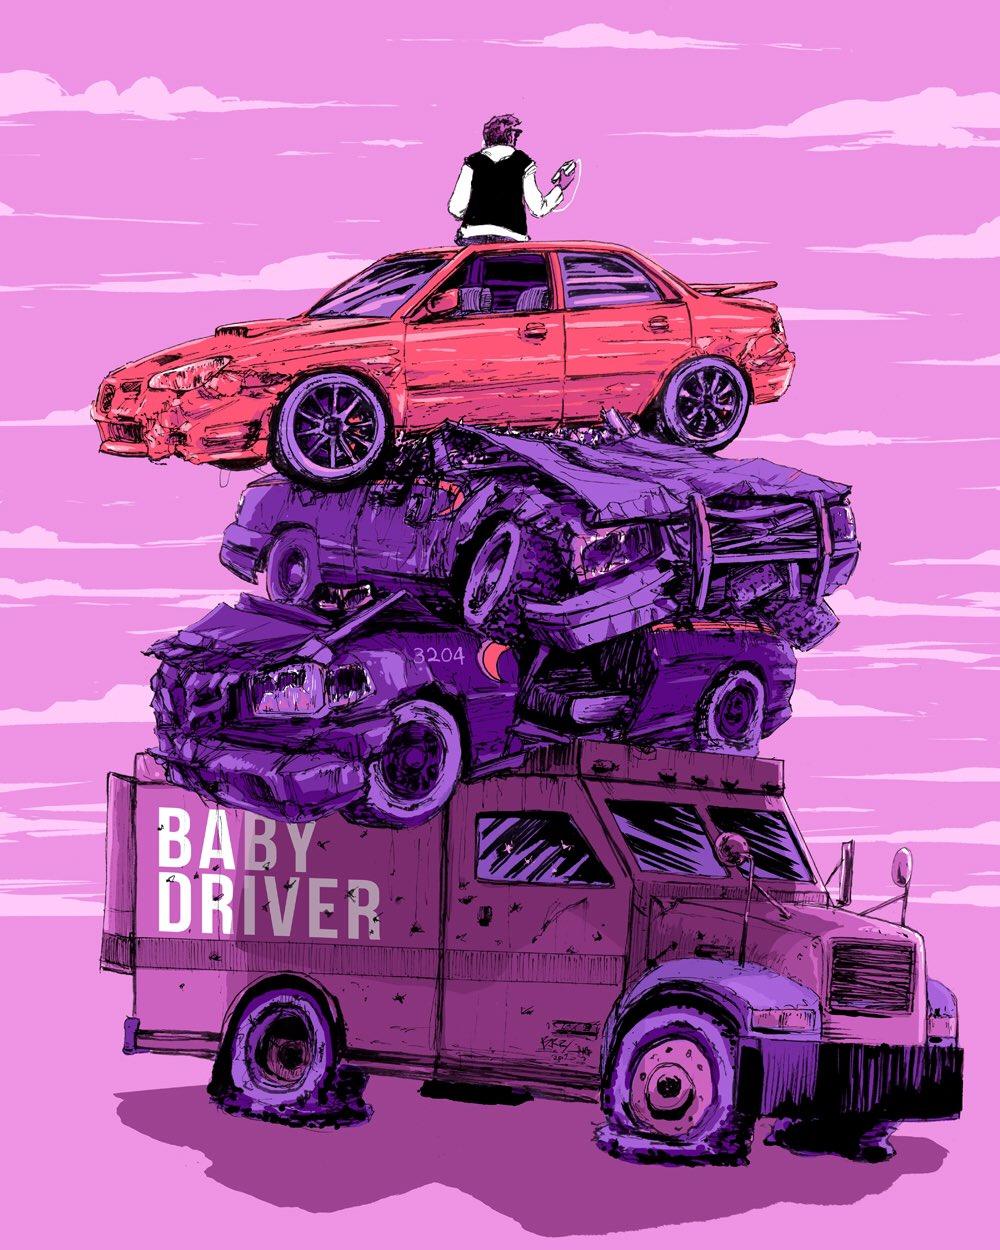 Baby_Driver_barry_blankenship_Barrytheartguy.jpg